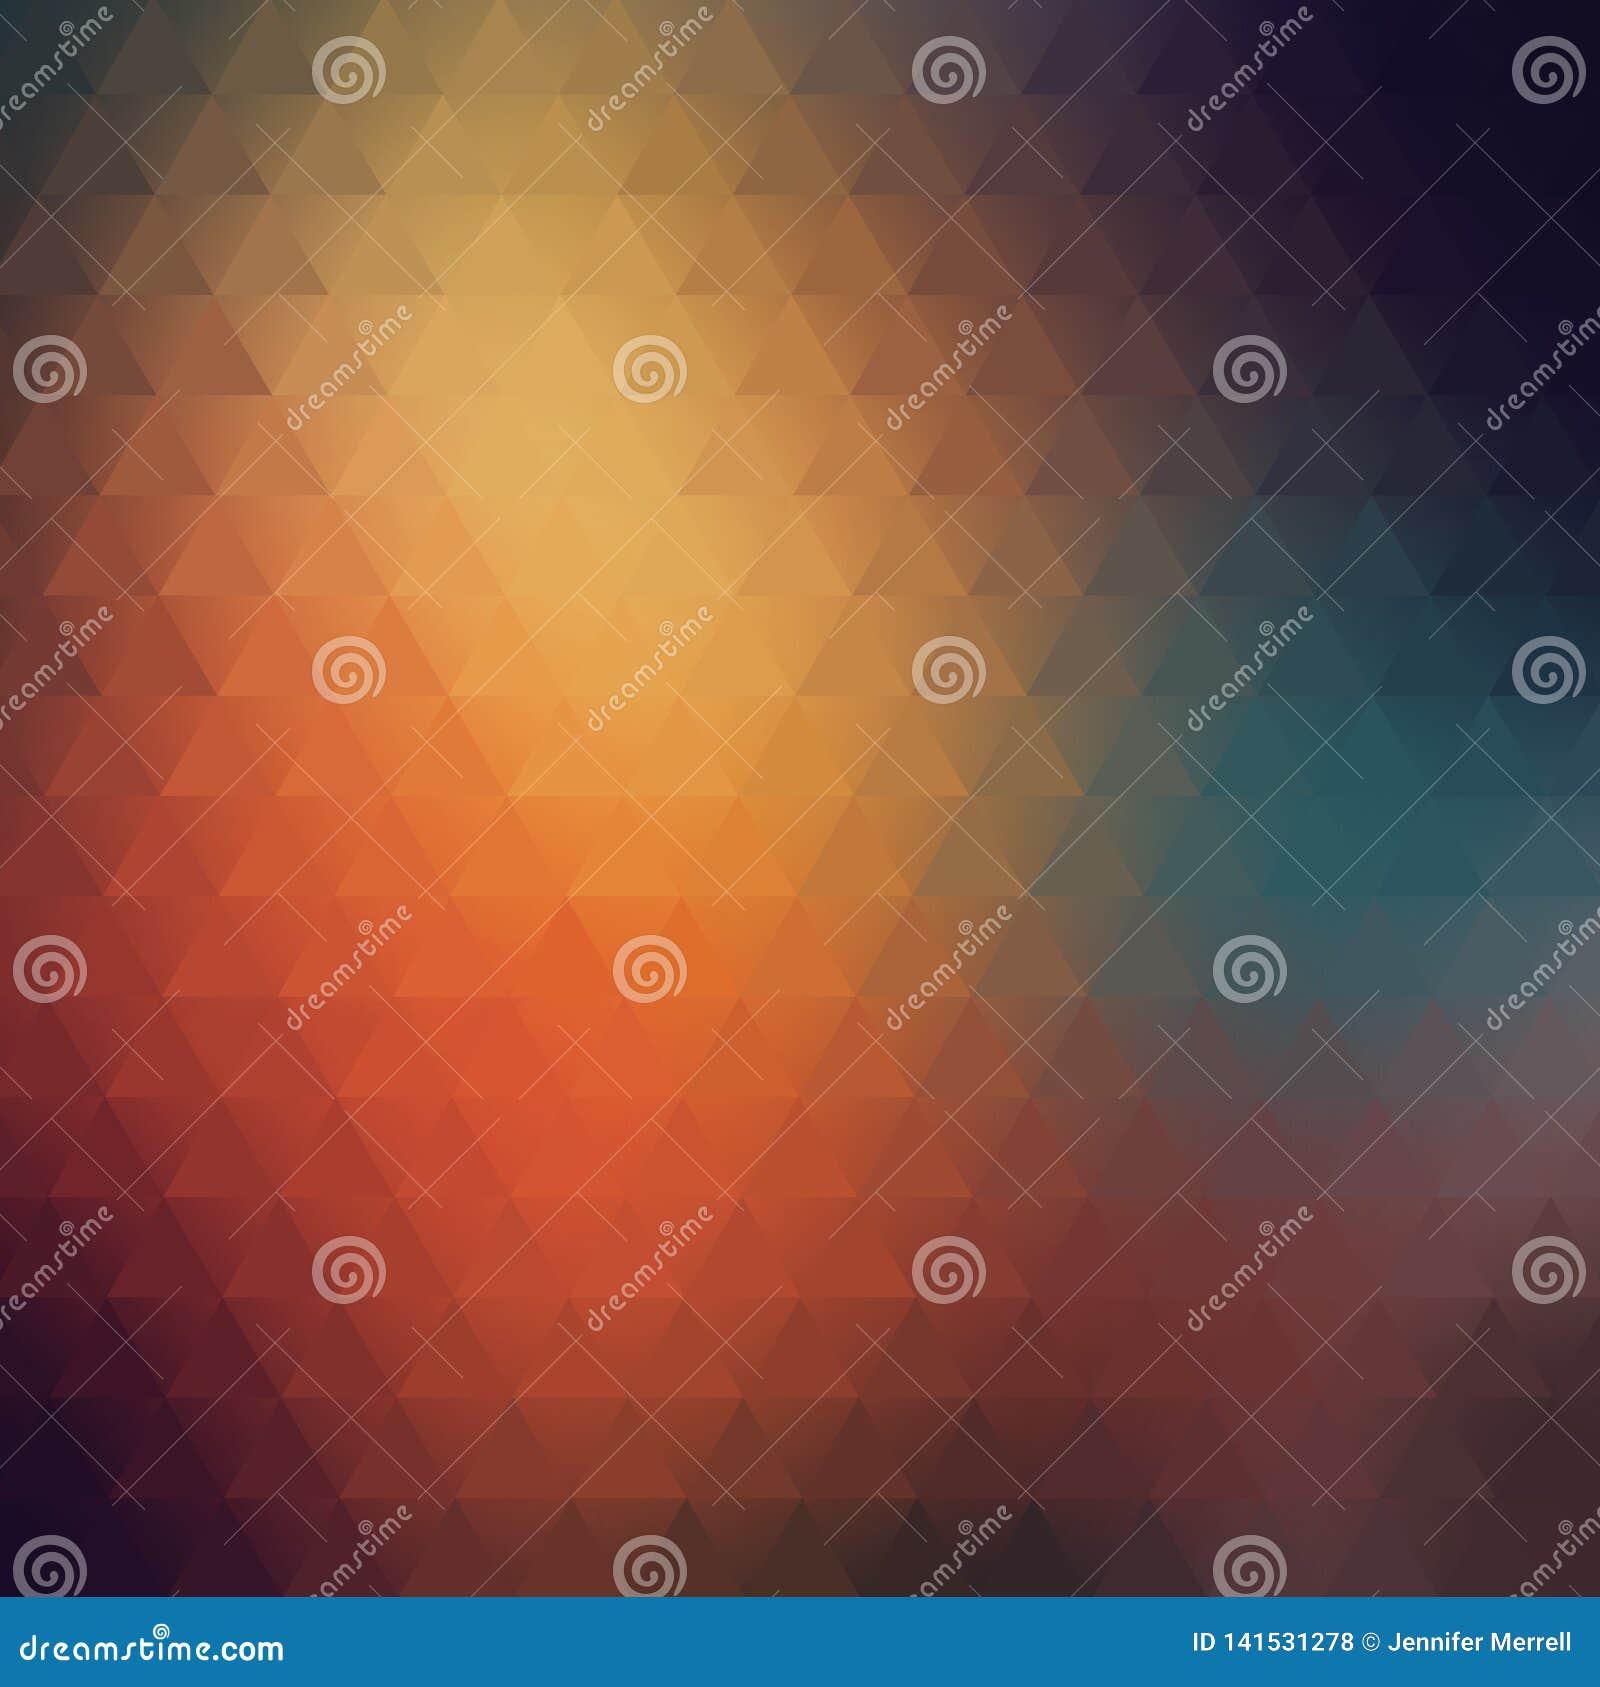 Fondo abstracto borroso colorido triangular geométrico